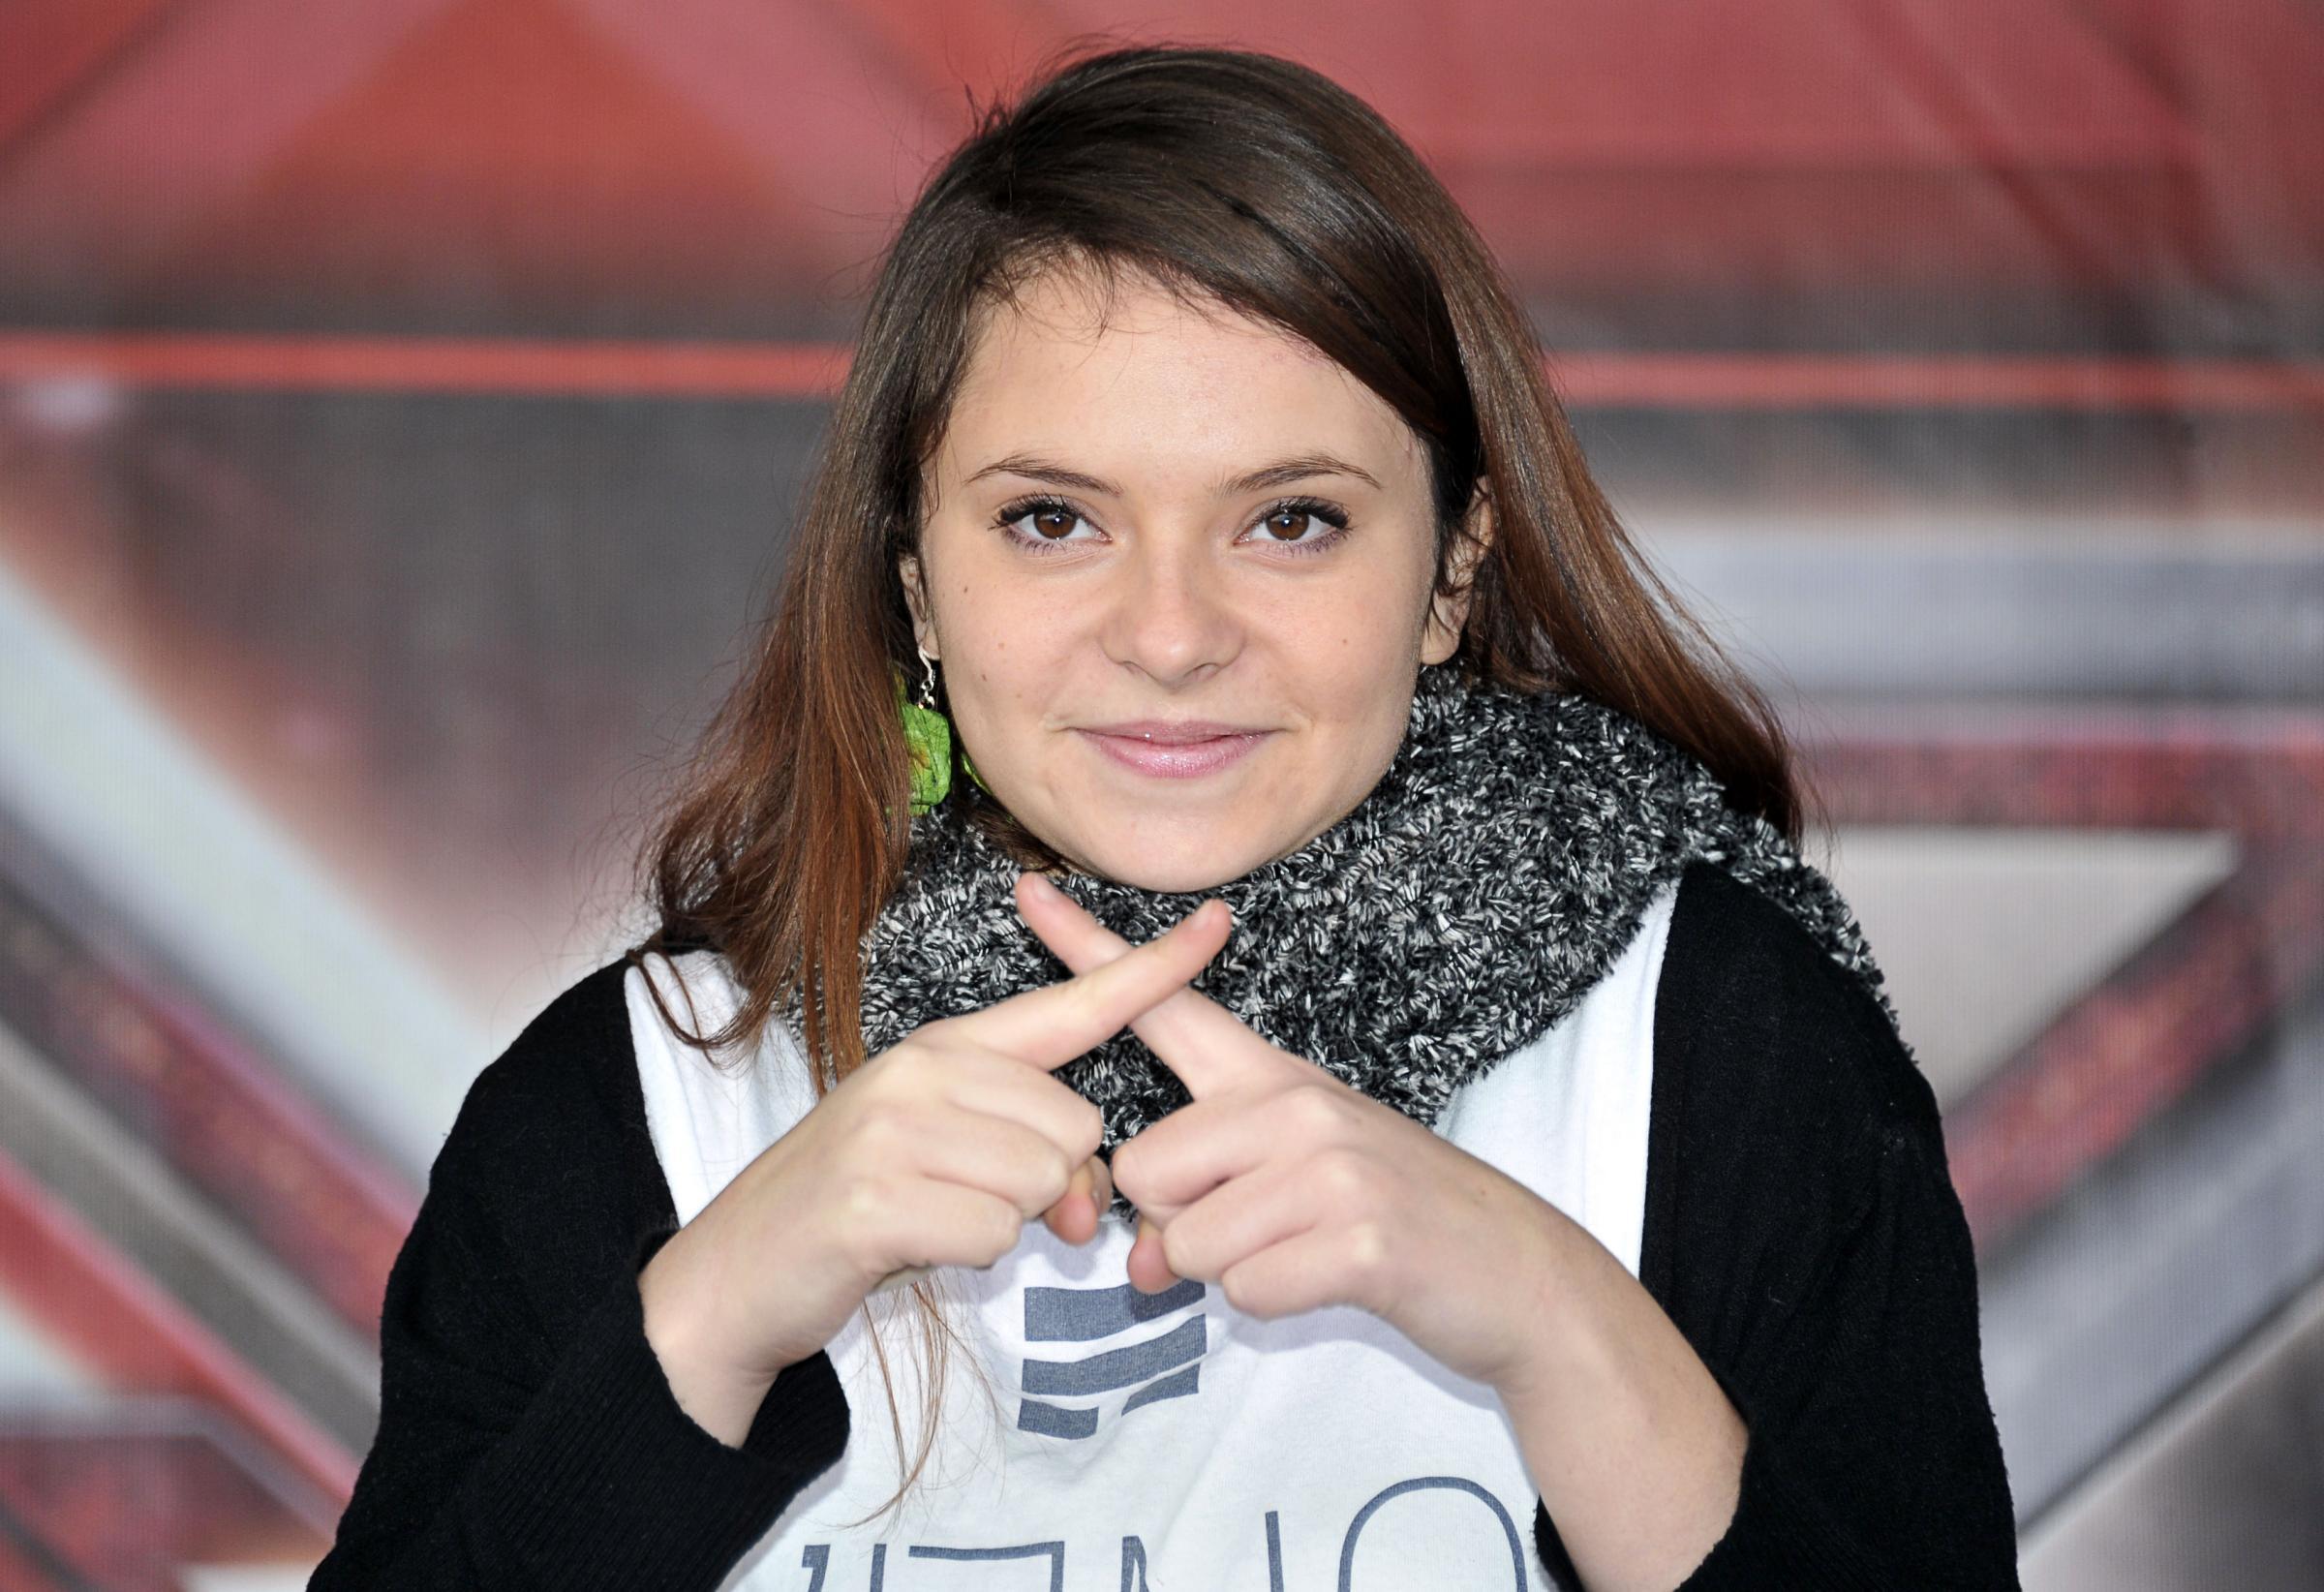 Francesca michielin ha vinto x factor 5